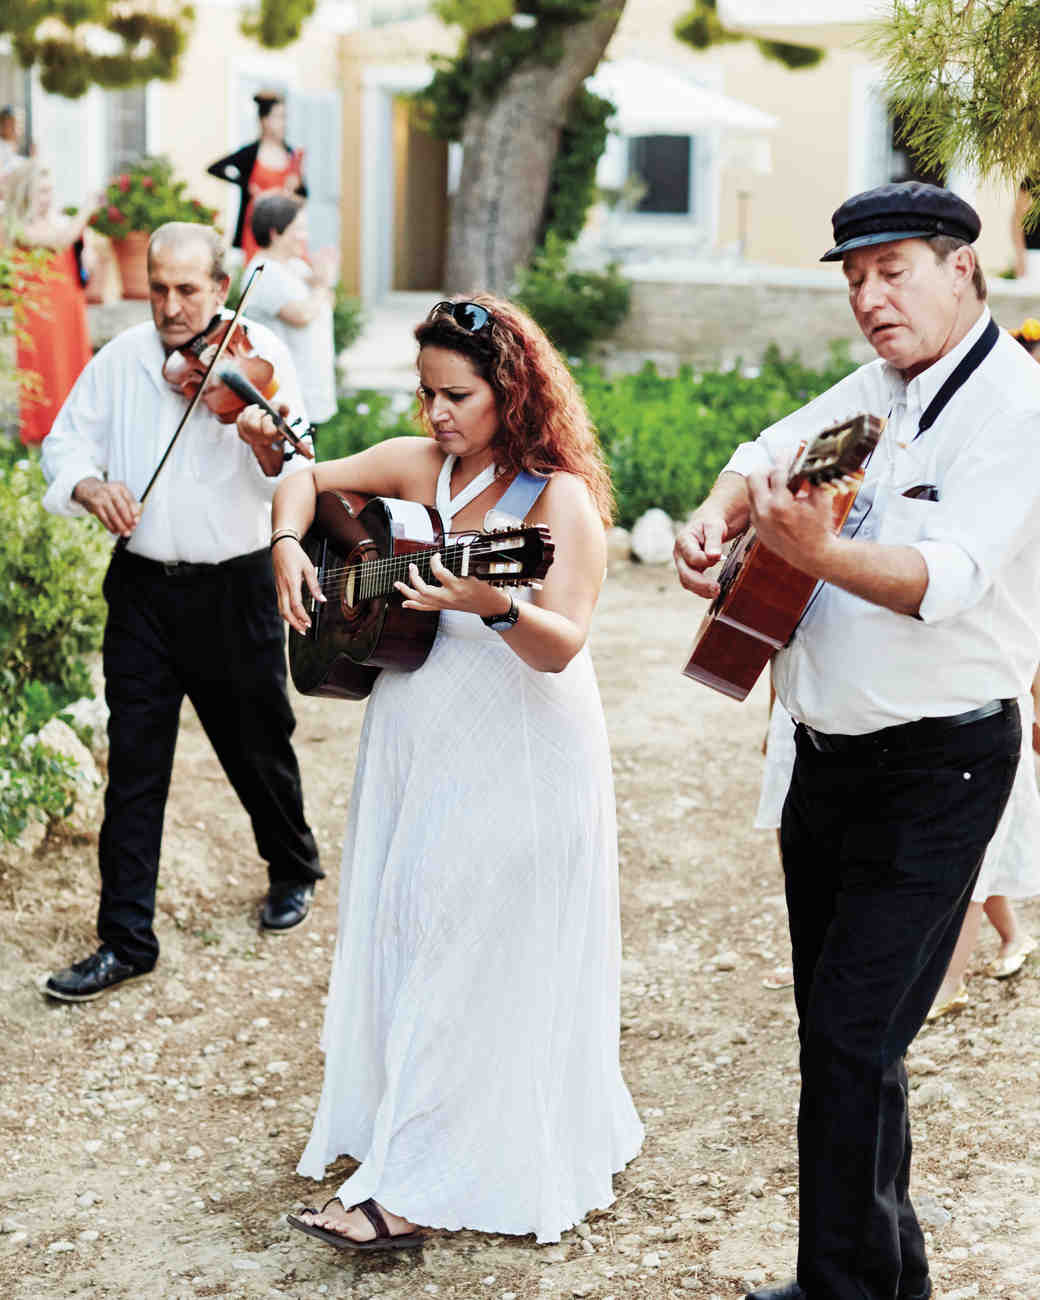 ana-alden-wedding-greece-611a4423-s111821.jpg